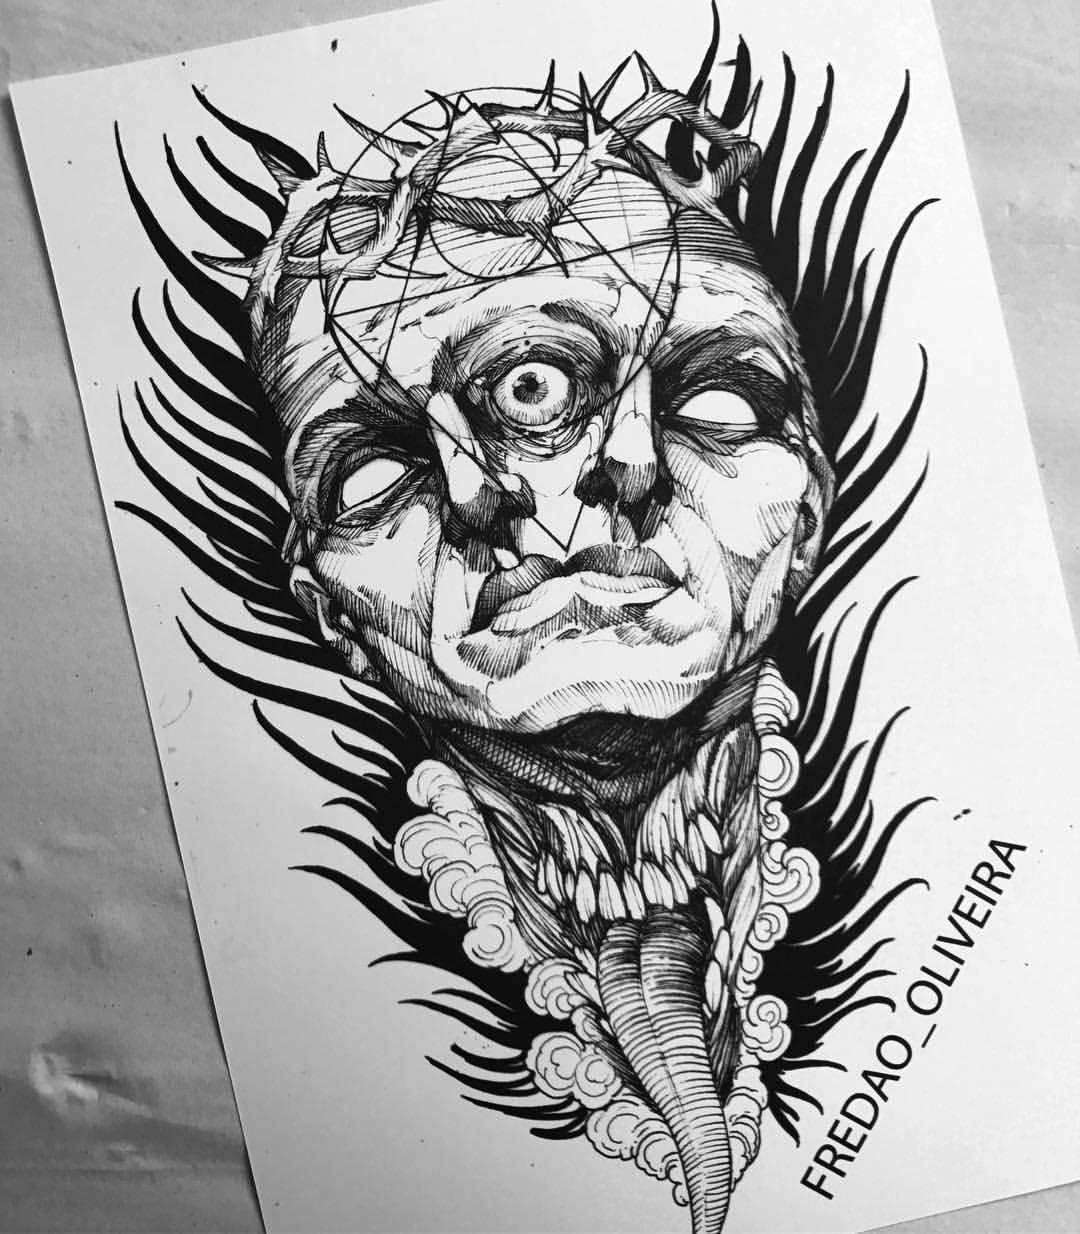 demon eyes tattoos designs images for tatouage. Black Bedroom Furniture Sets. Home Design Ideas